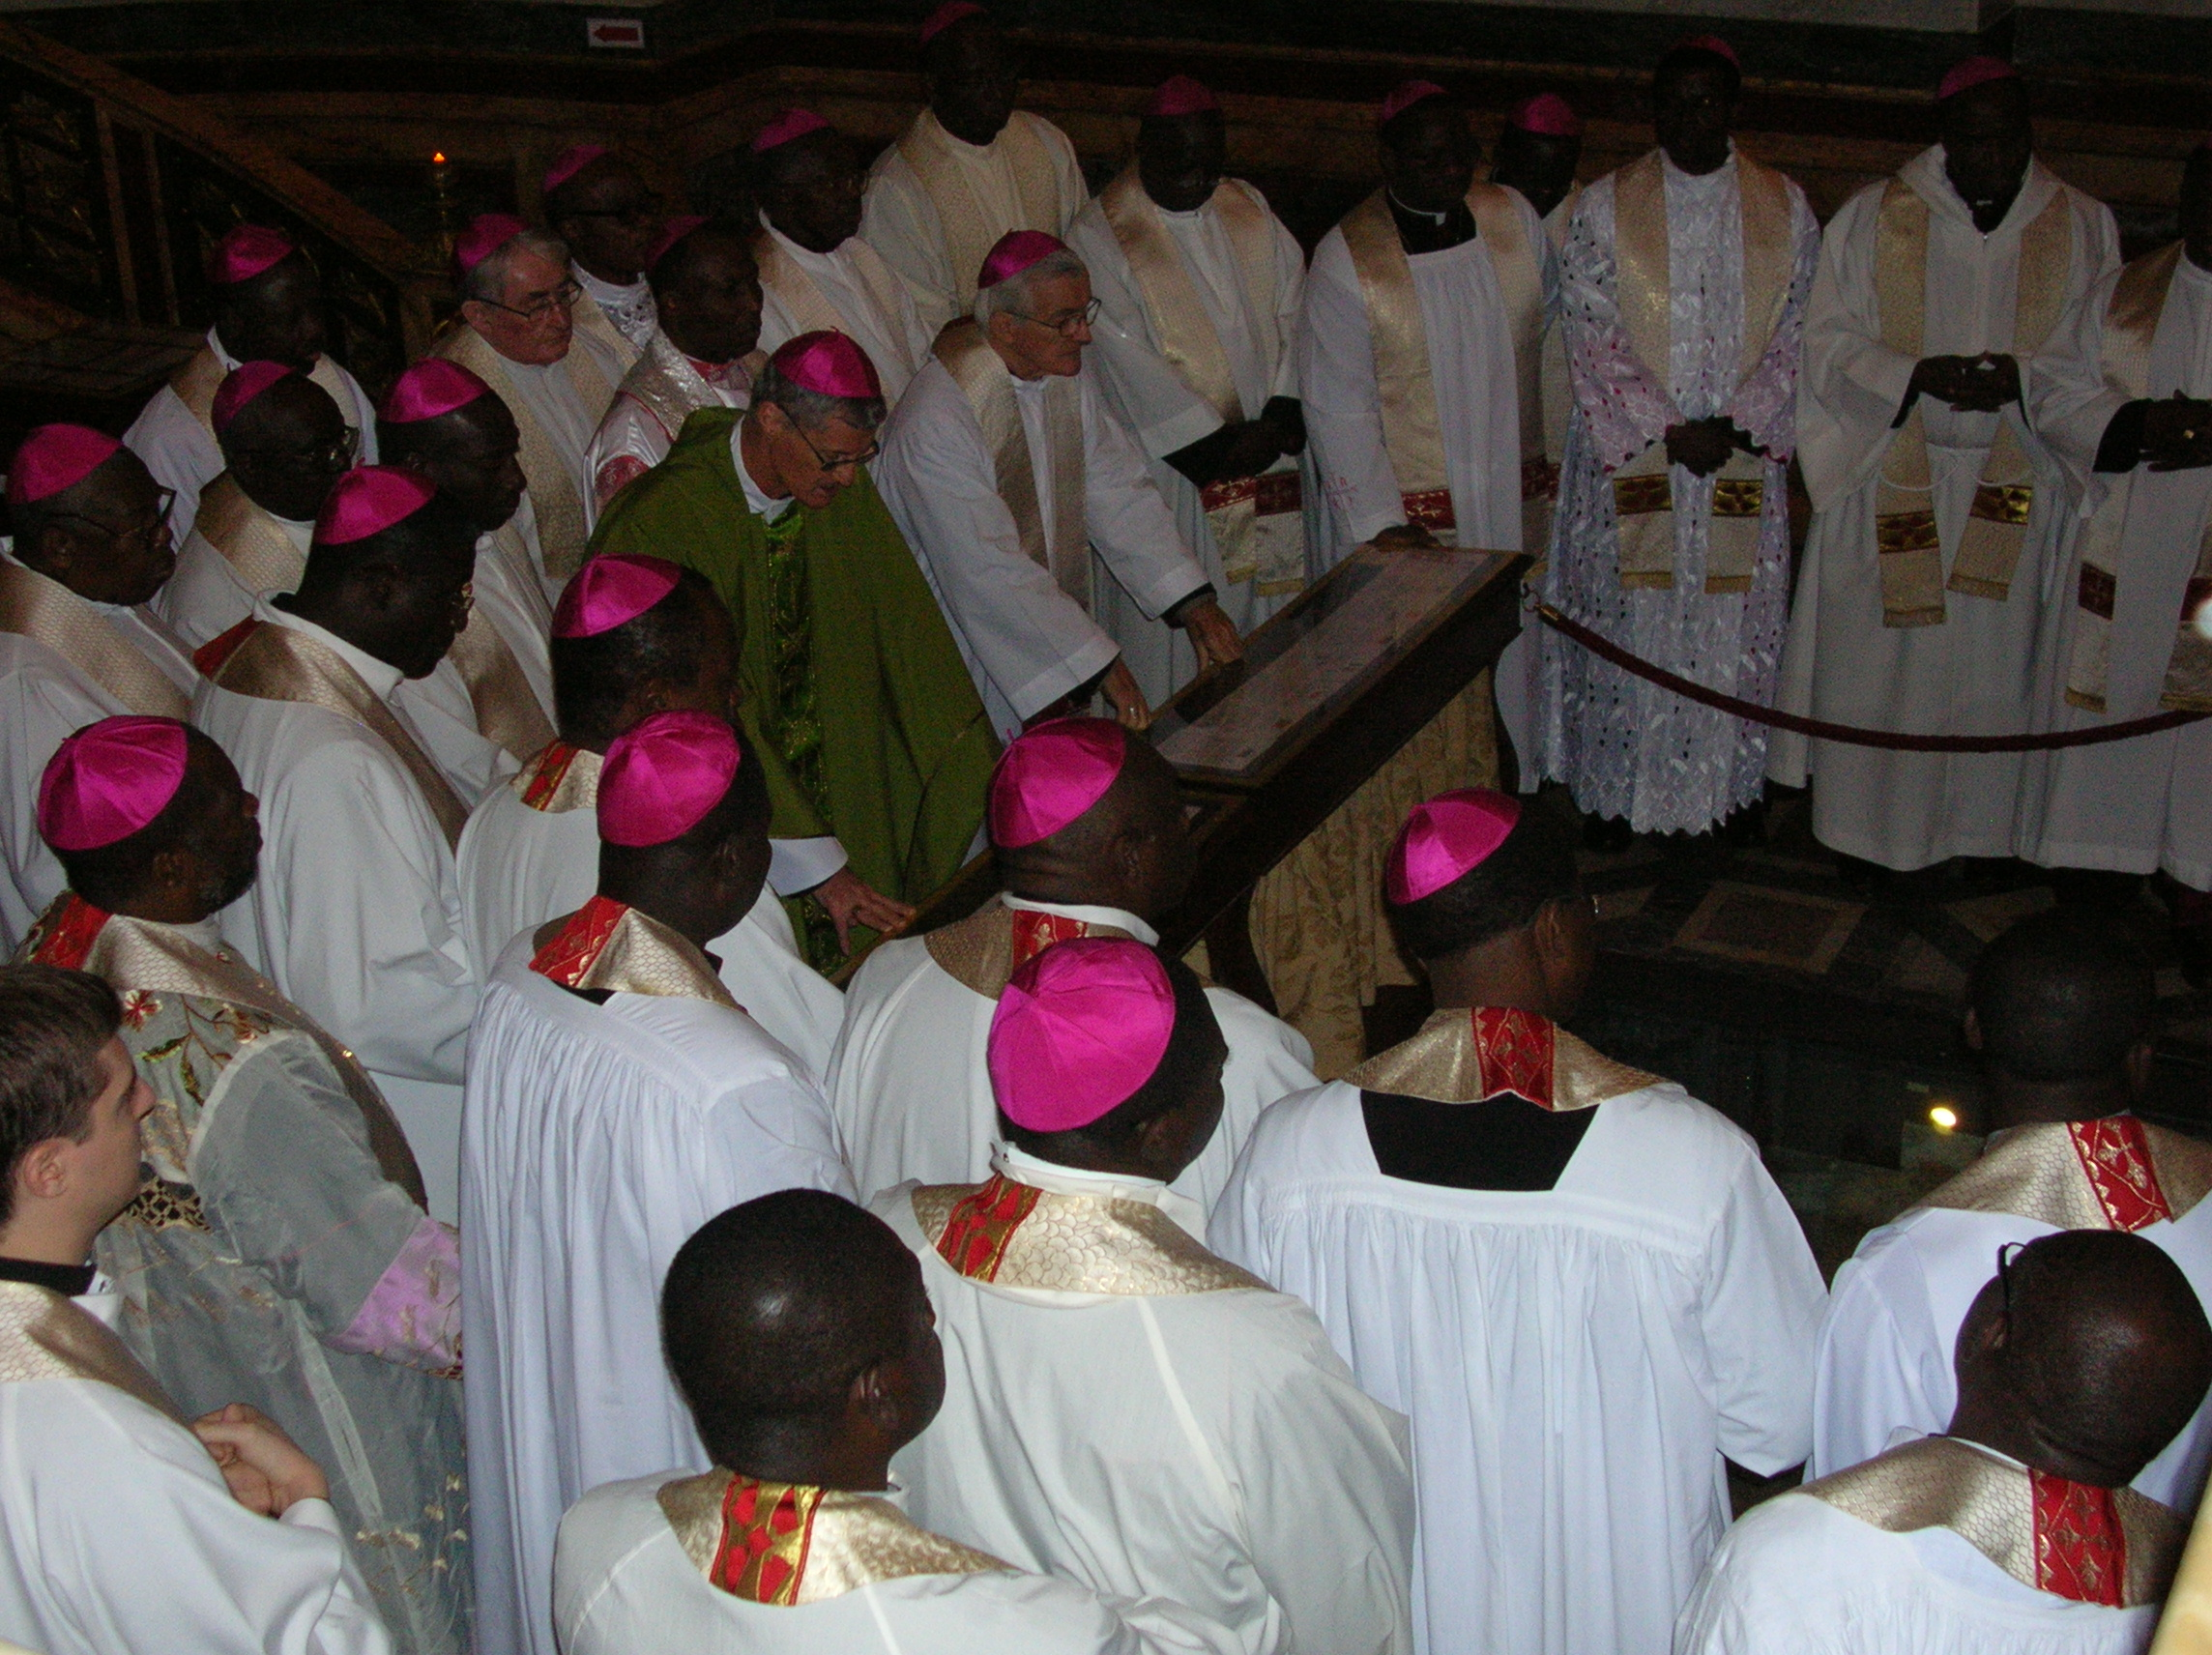 Nigerian bishops pray at tomb of St. Paul